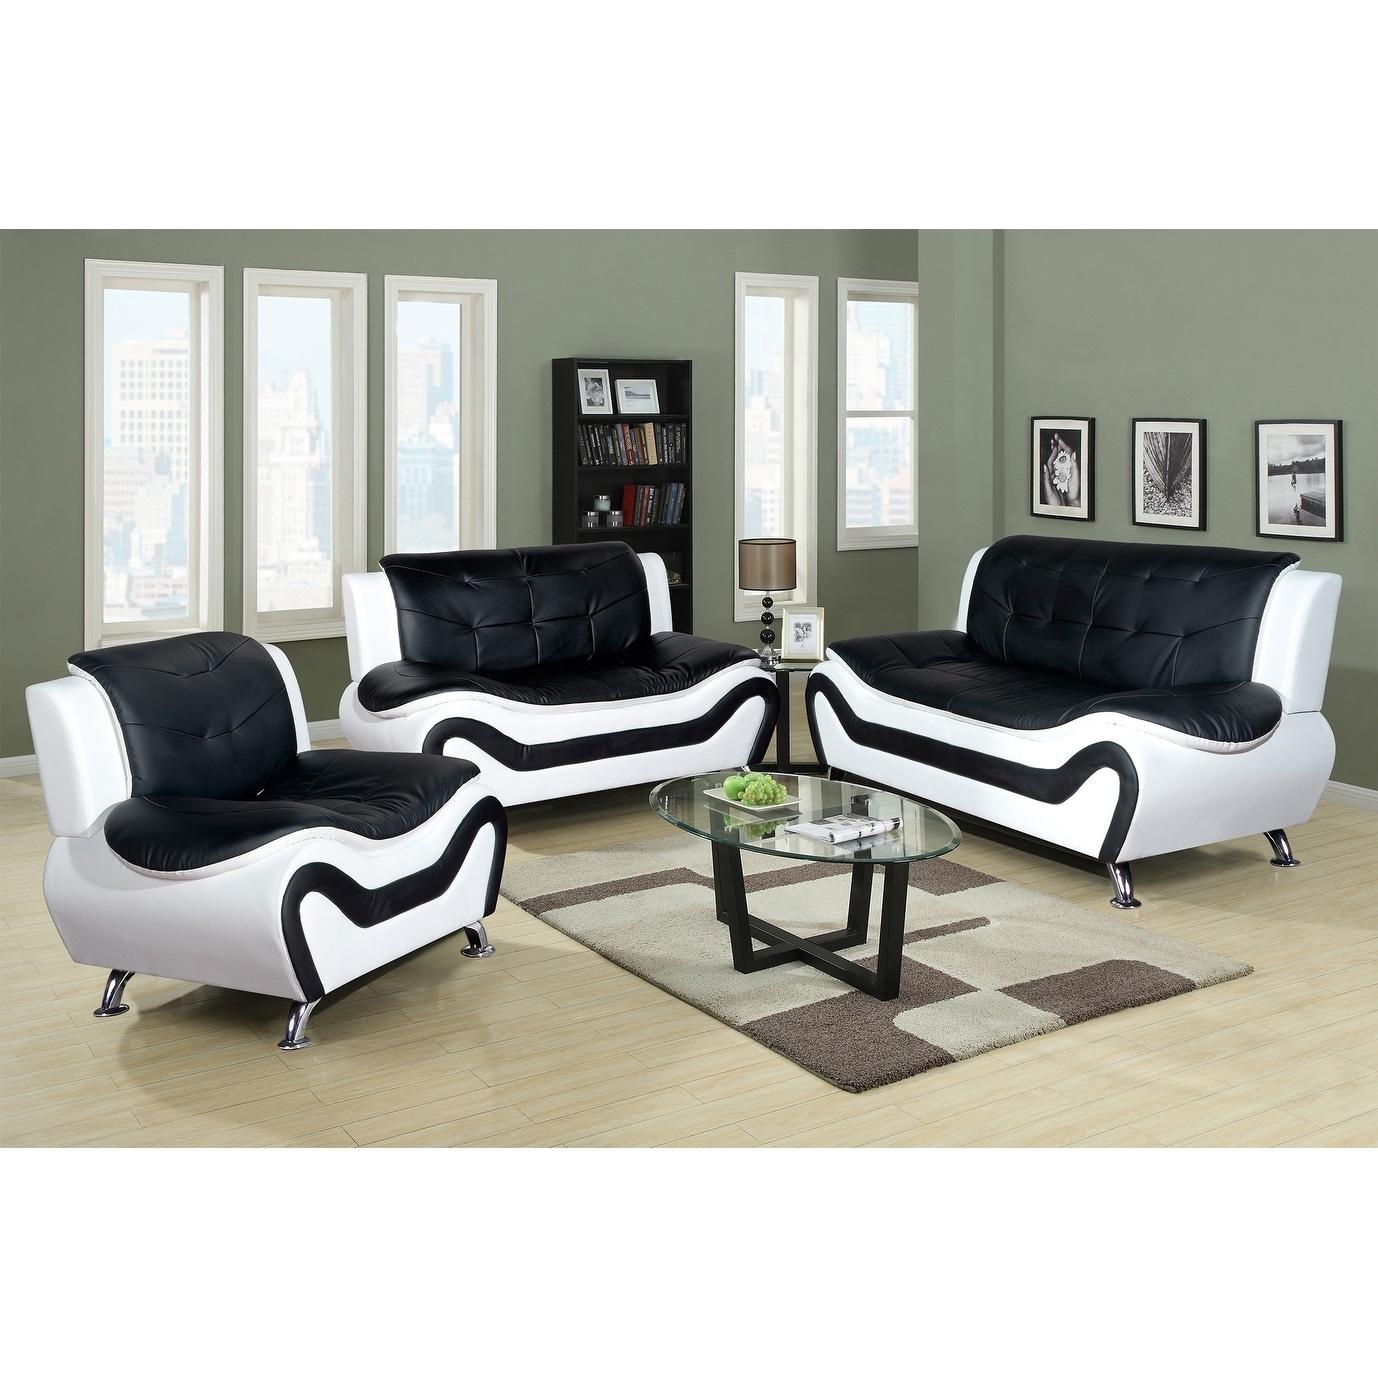 Golden Coast Furniture Ceccina Modern Faux Leather 3 PCS Furniture Set  Multiple Colors